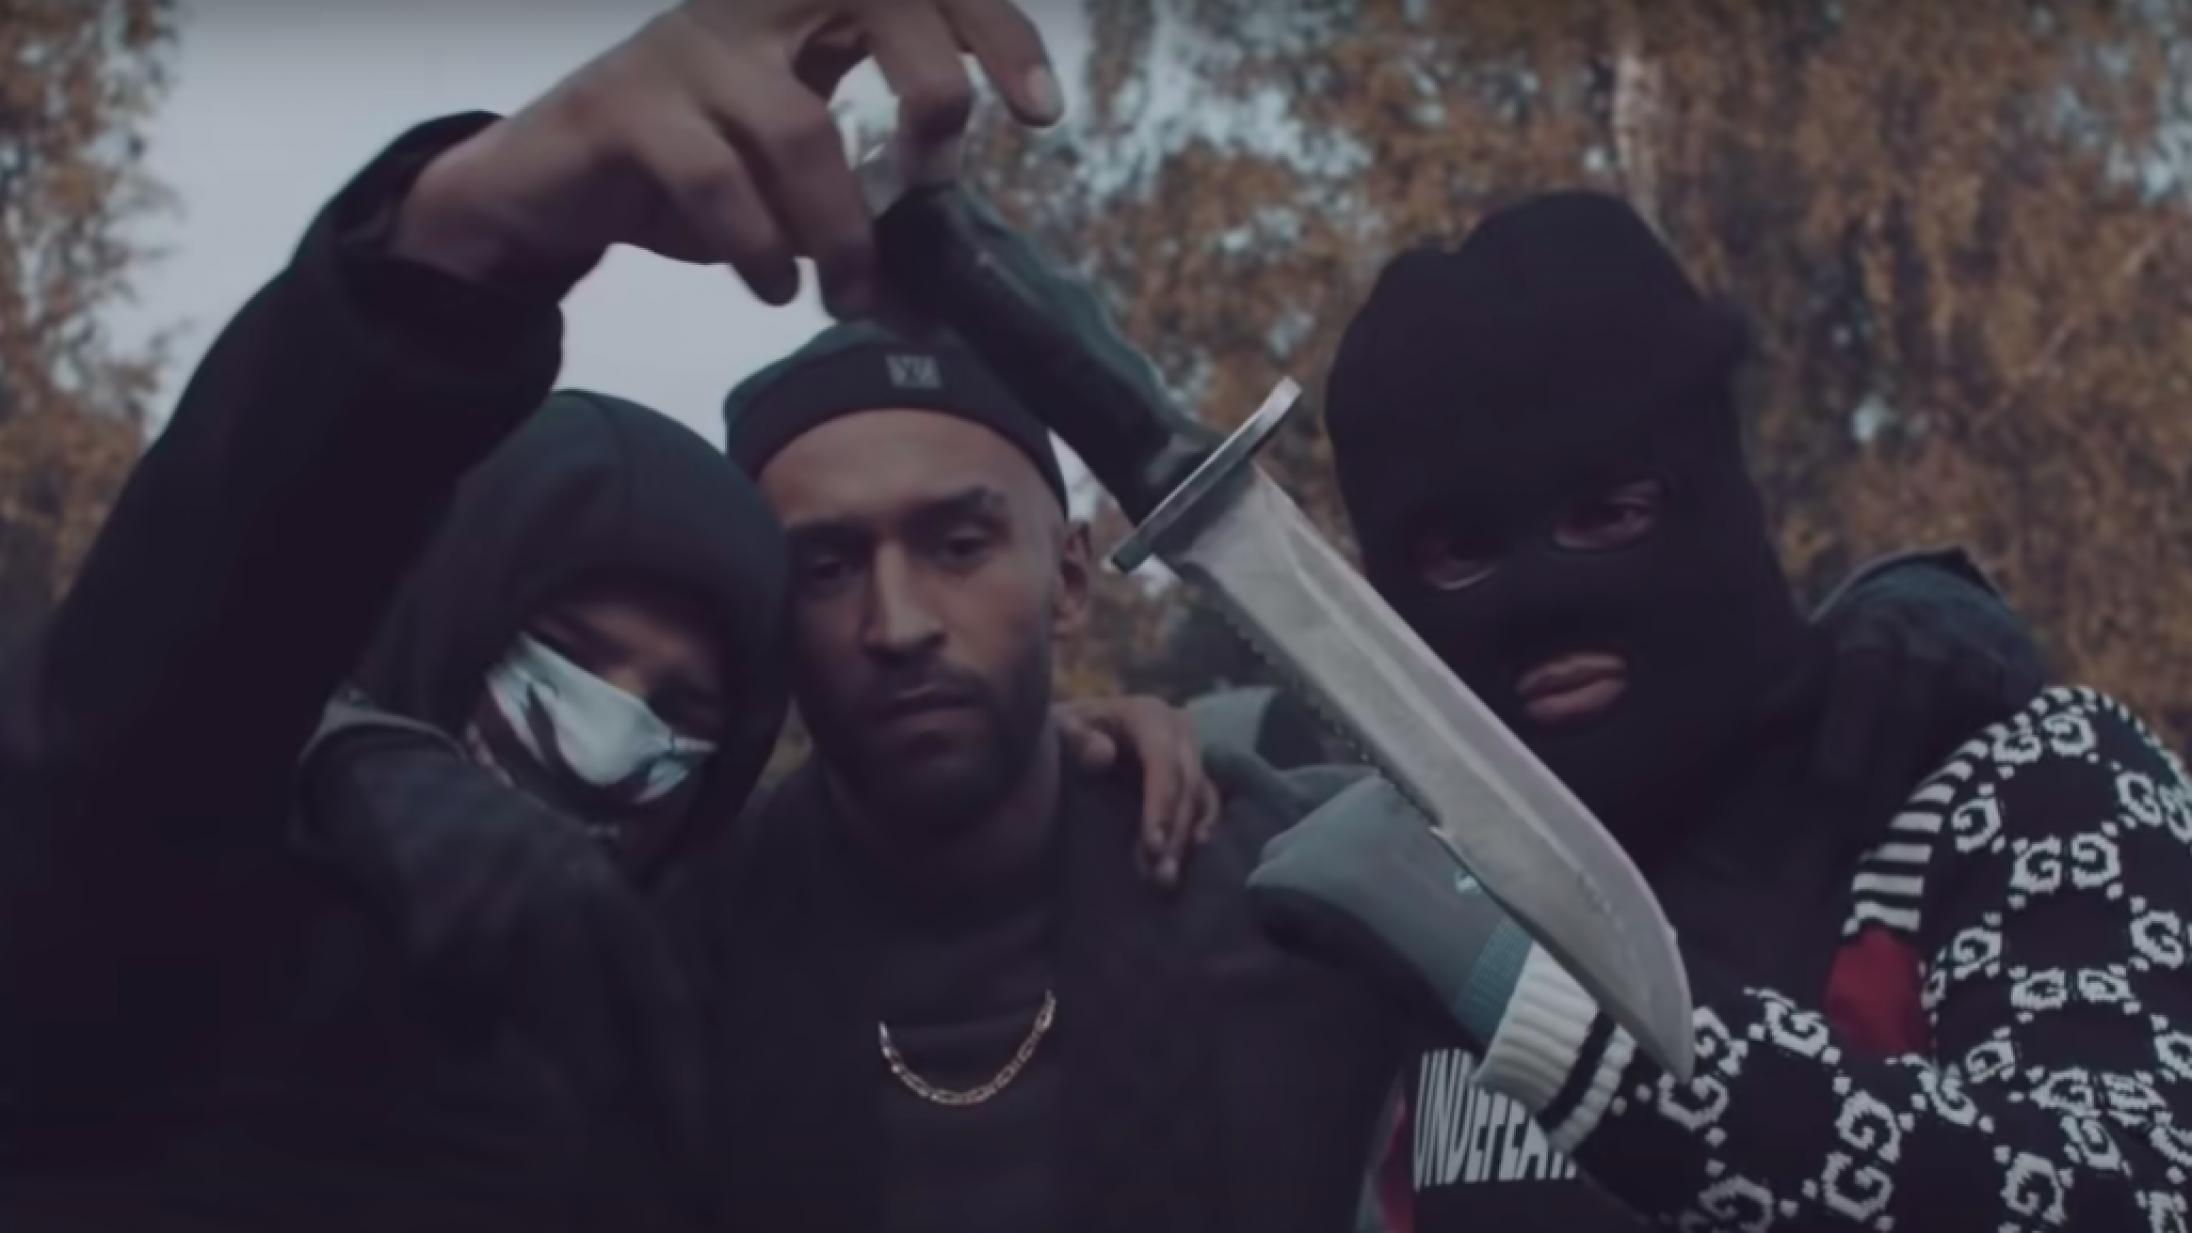 Dansk hiphops flirt med bandemiljøet har nået et kritisk punkt